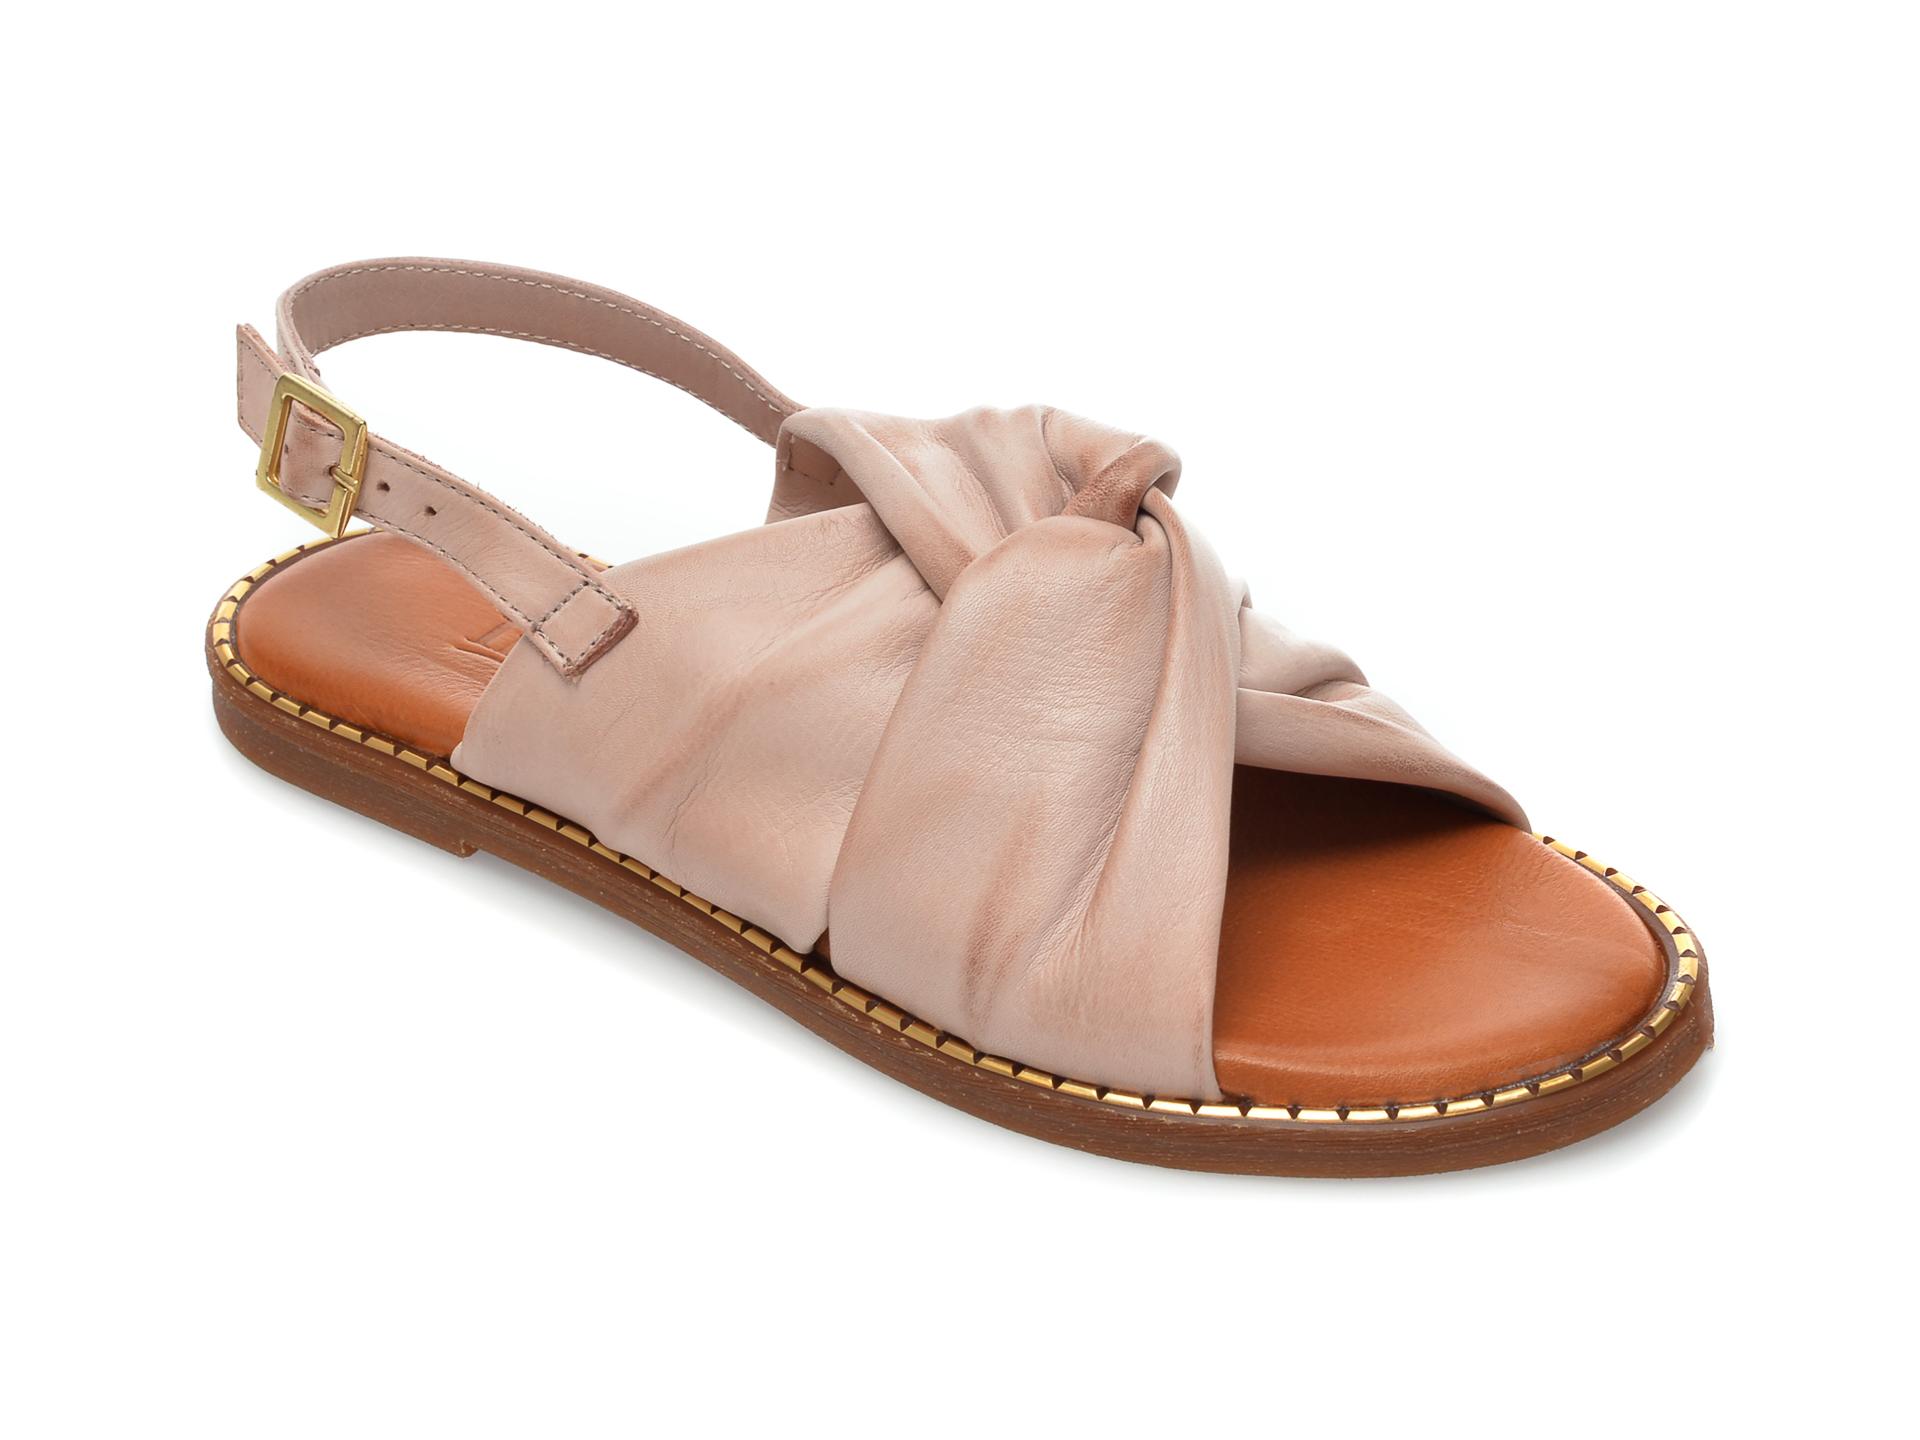 Sandale IMAGE nude, 719, din piele naturala imagine otter.ro 2021